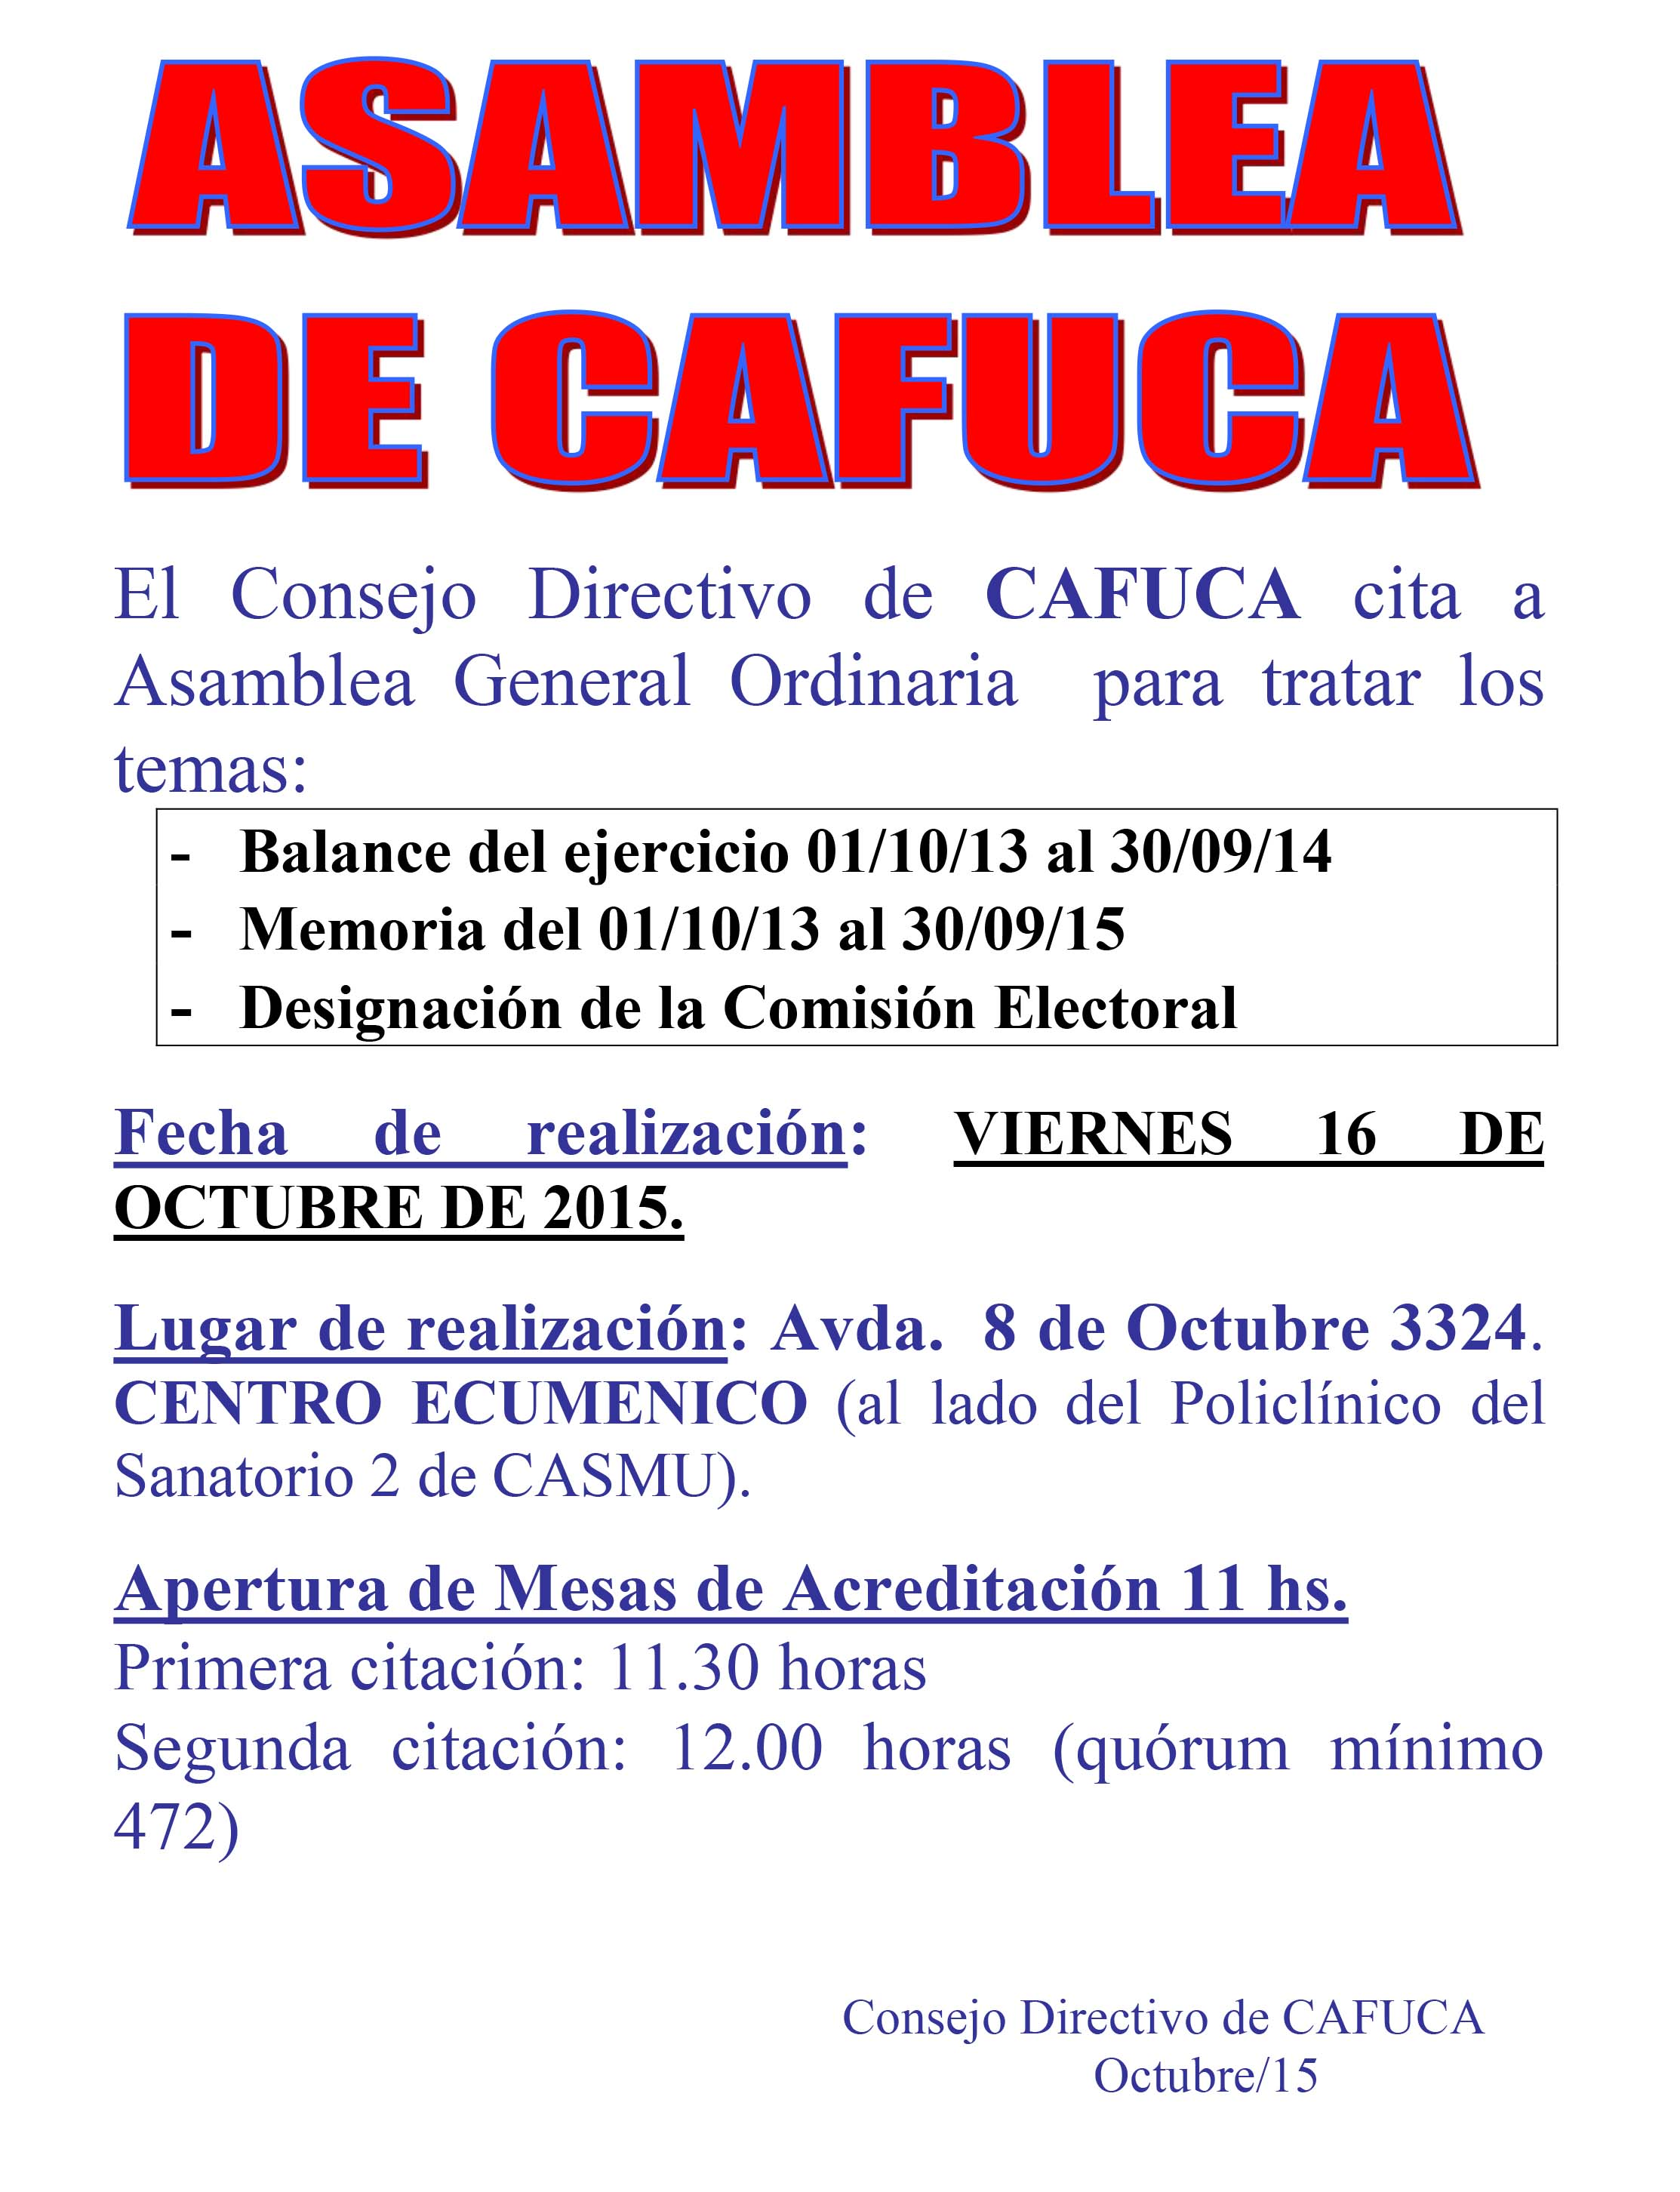 ASAMBLEA GENERAL ORDINARIA  DE CAFUCA